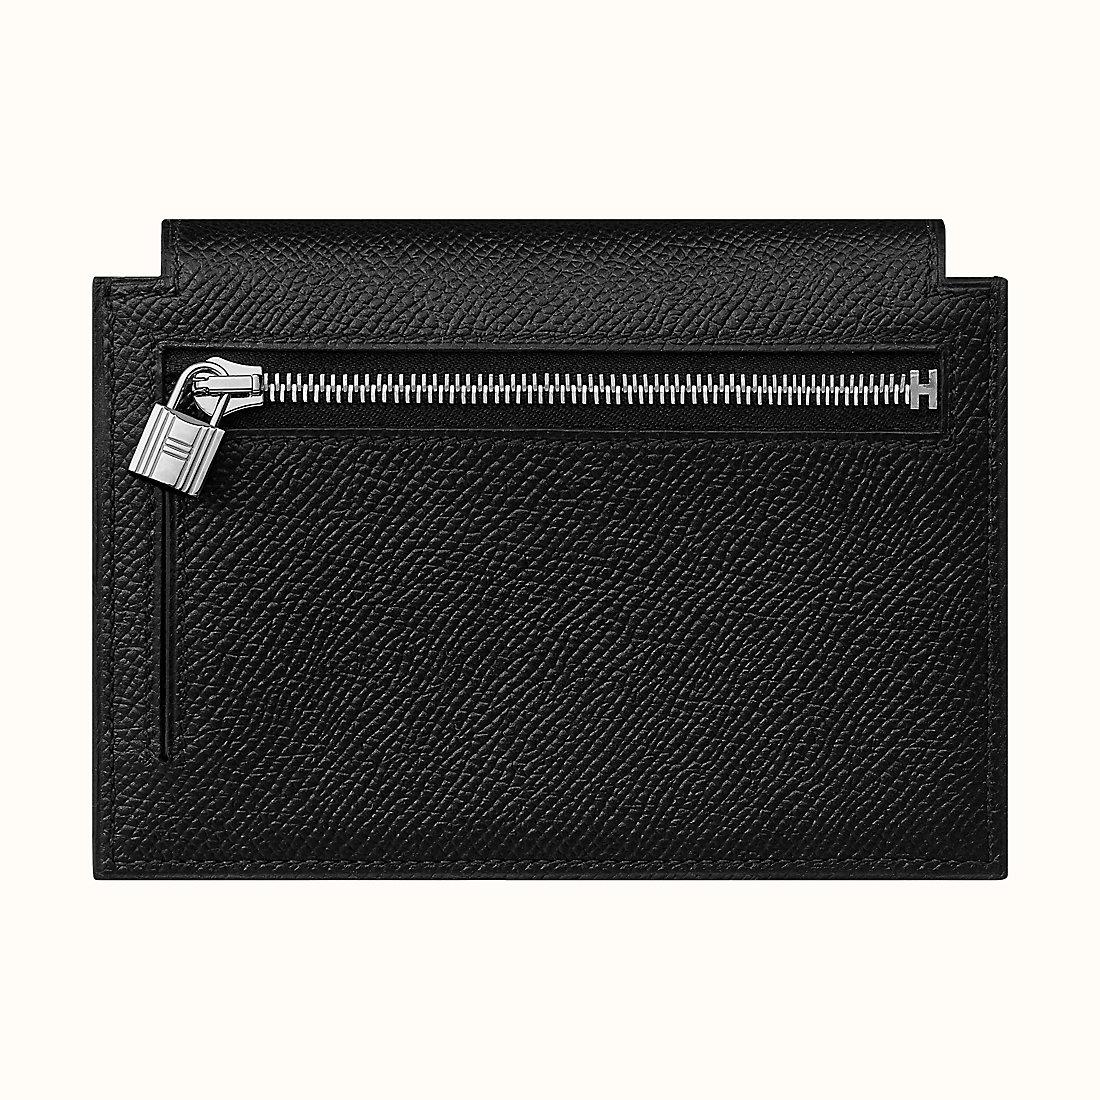 香港大嶼山區馬灣 Hong Kong Hermes Kelly Pocket wallet 短錢包